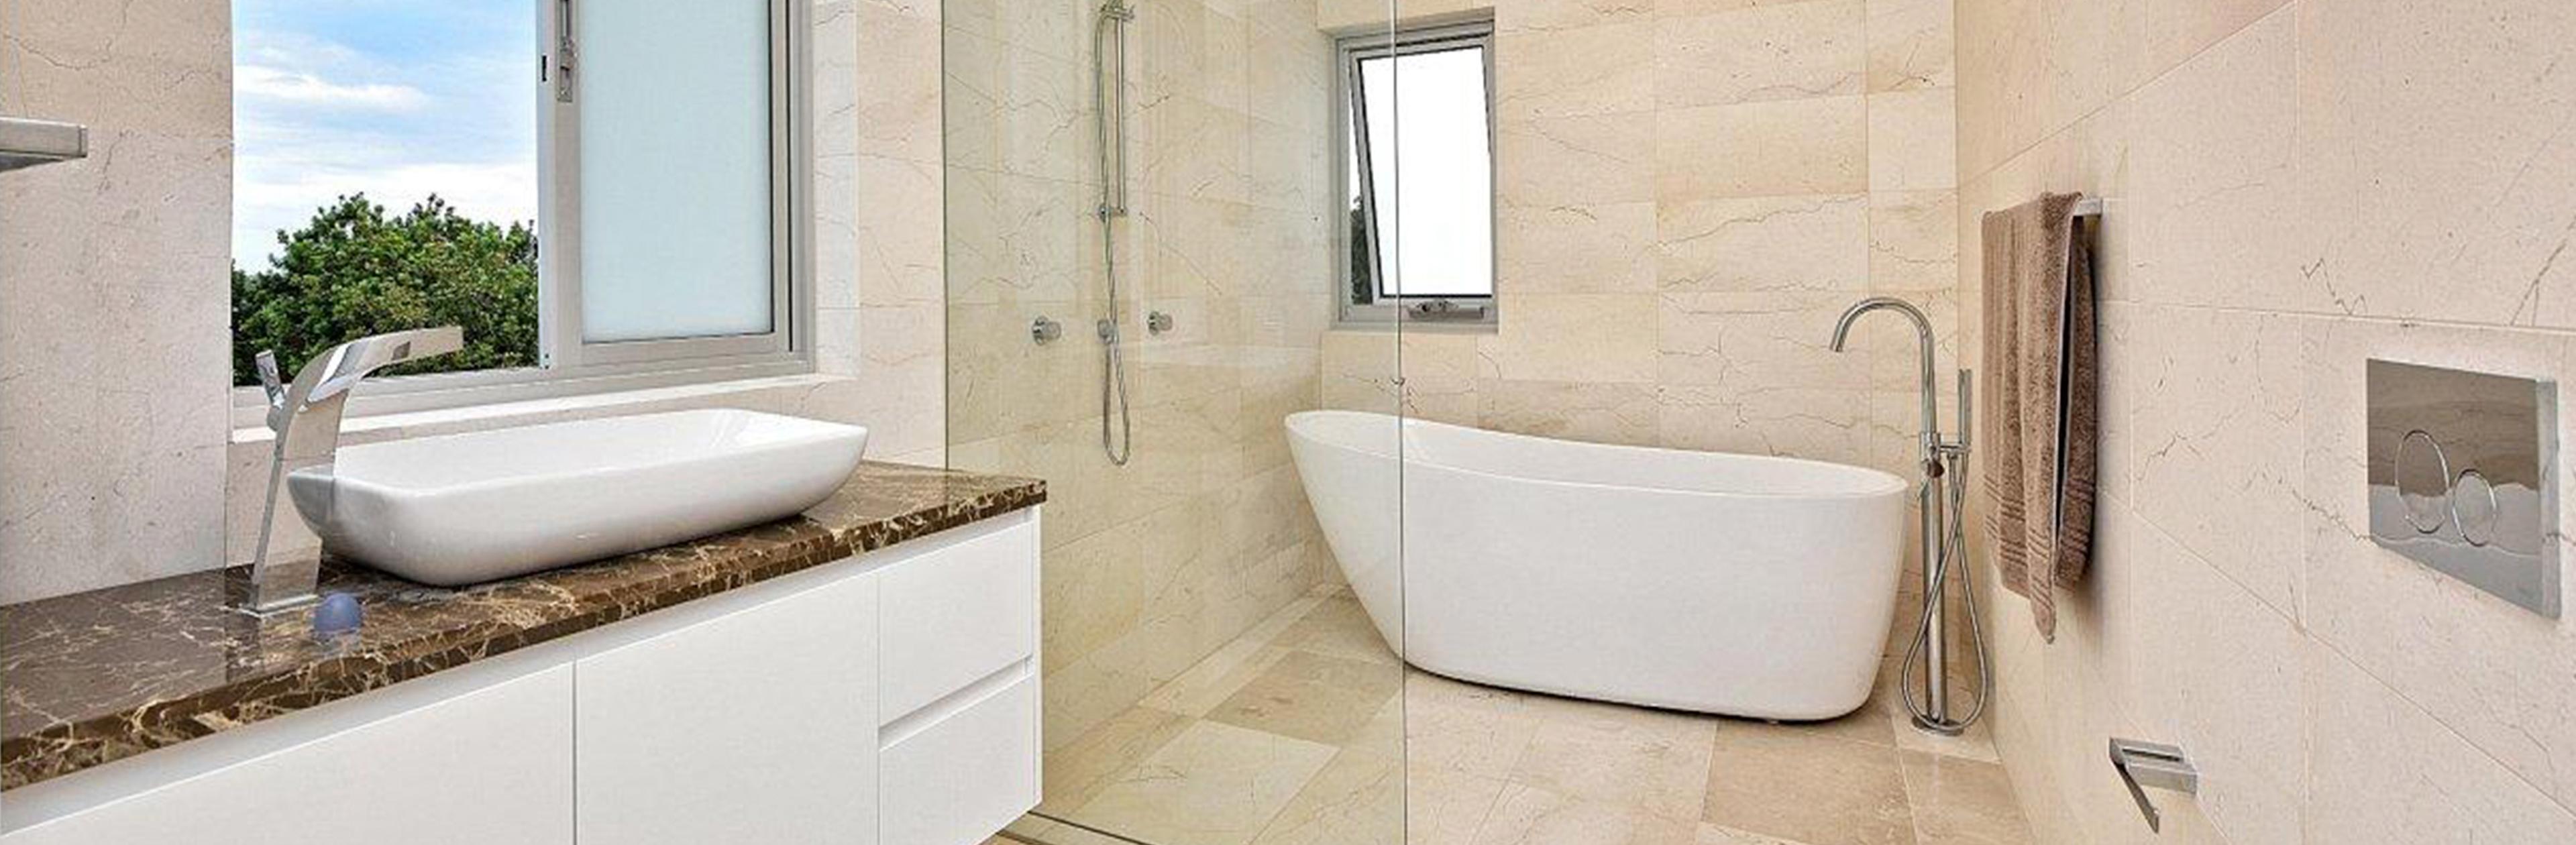 Bathroom Design Ideas Melbourne, Renovation Ideas - Judes Bathrooms